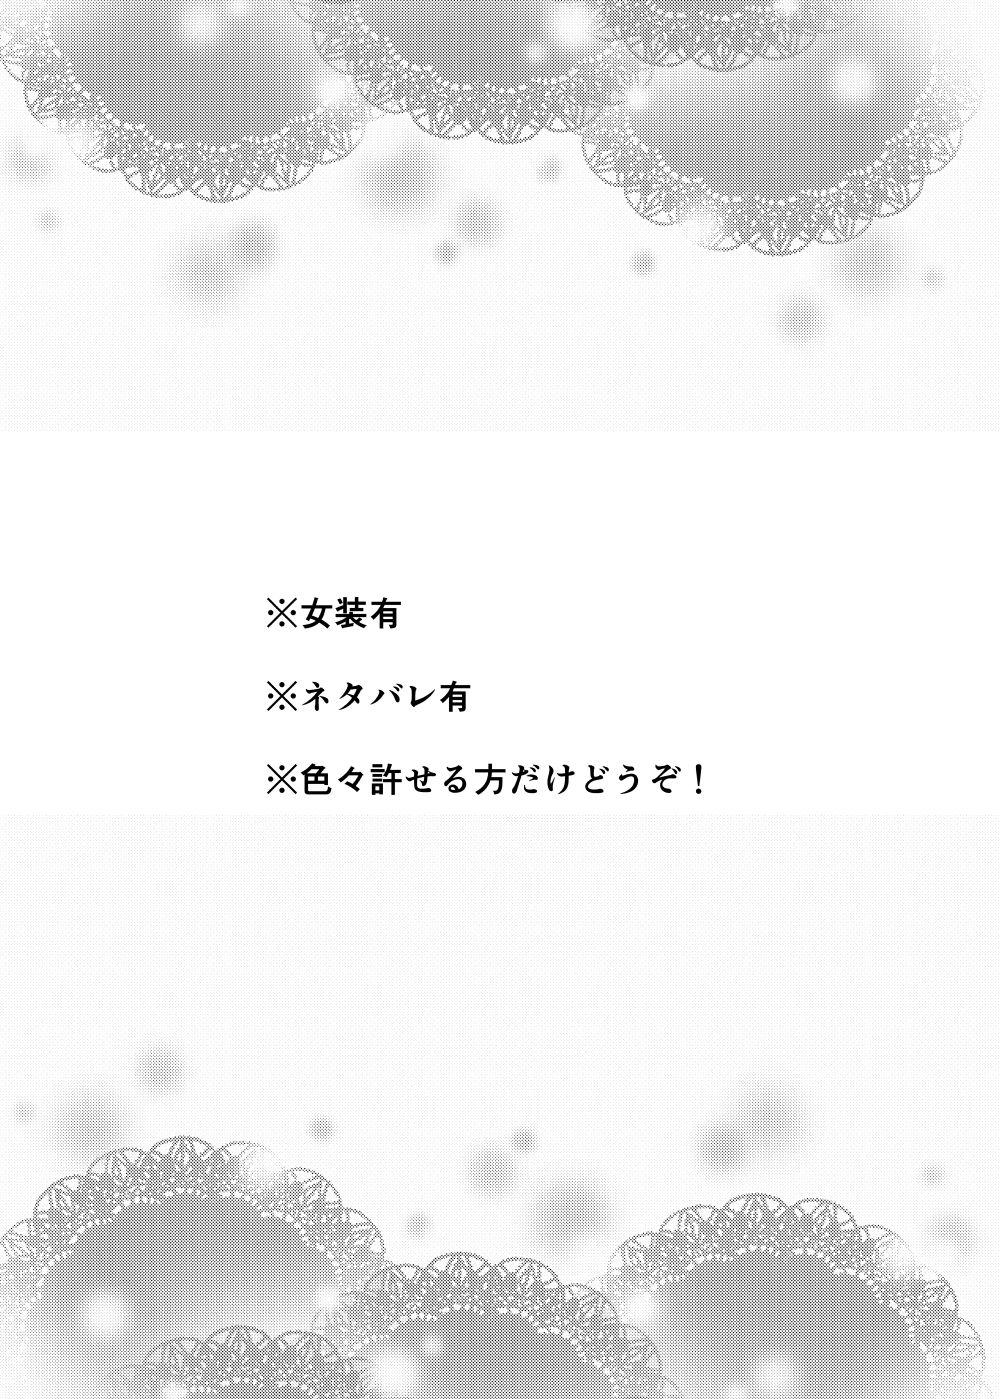 Usotsuki Hanayome 1